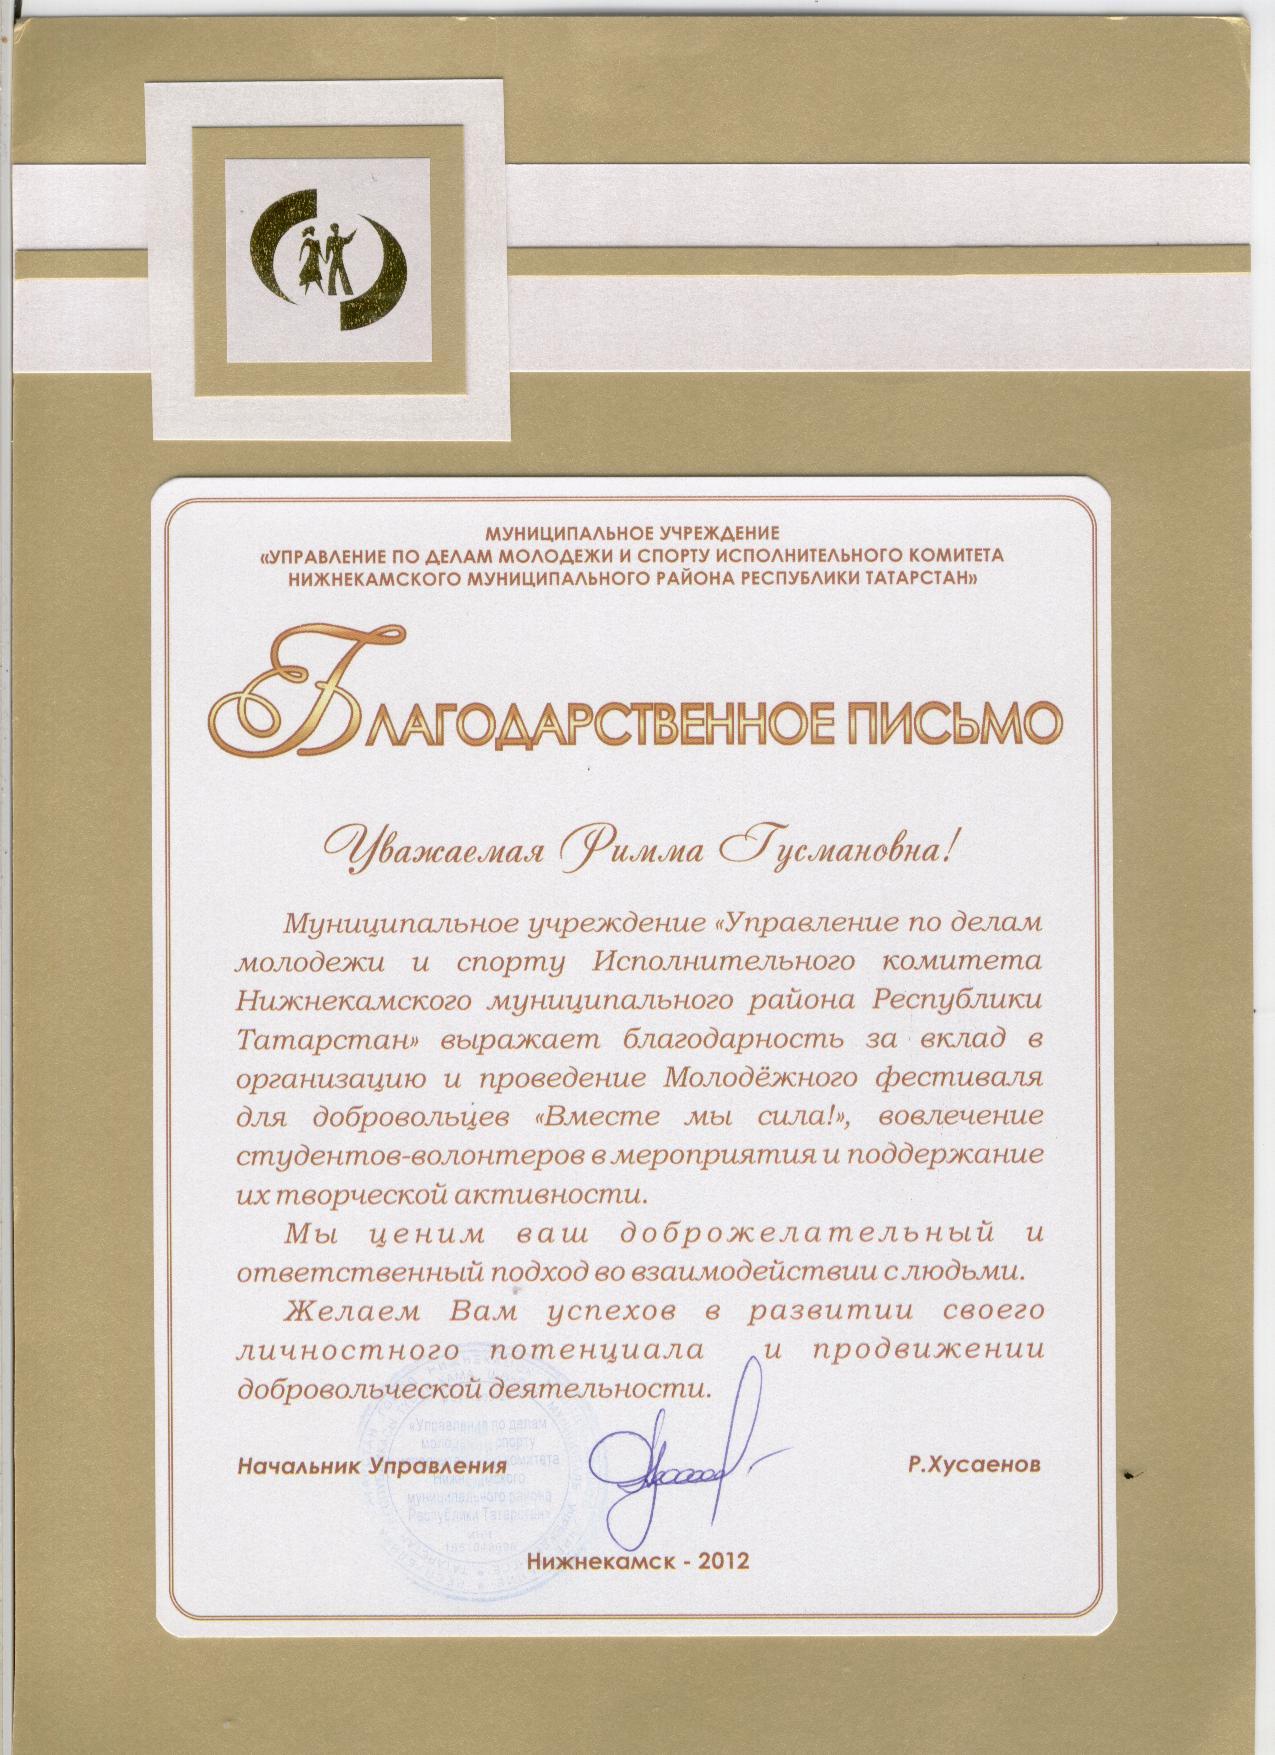 F:\Всероссйский конкурс Портфолио выпускника\РИММА\Римма 013.jpg